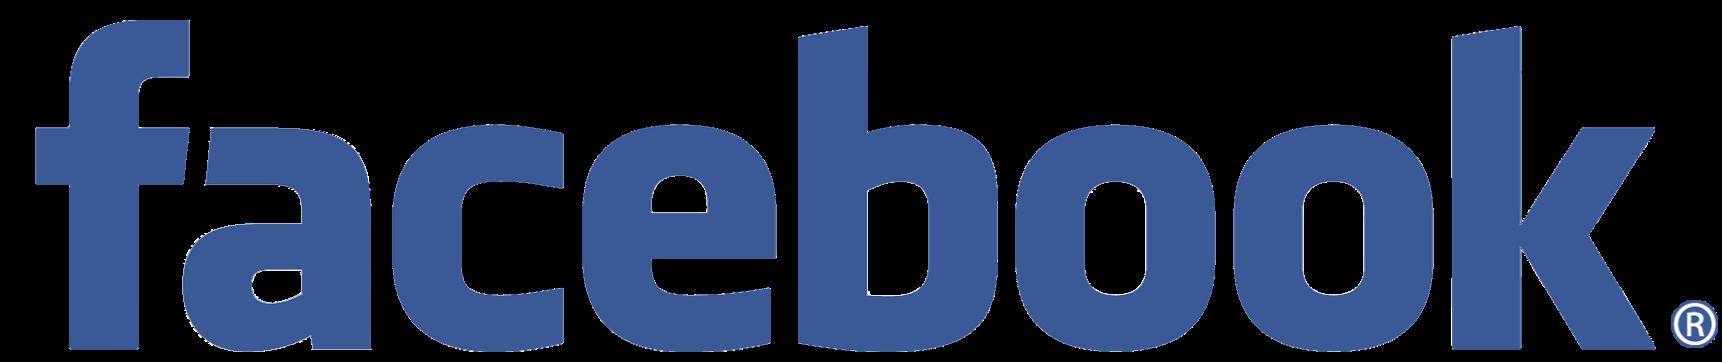 facebook-logo-png-1722.png